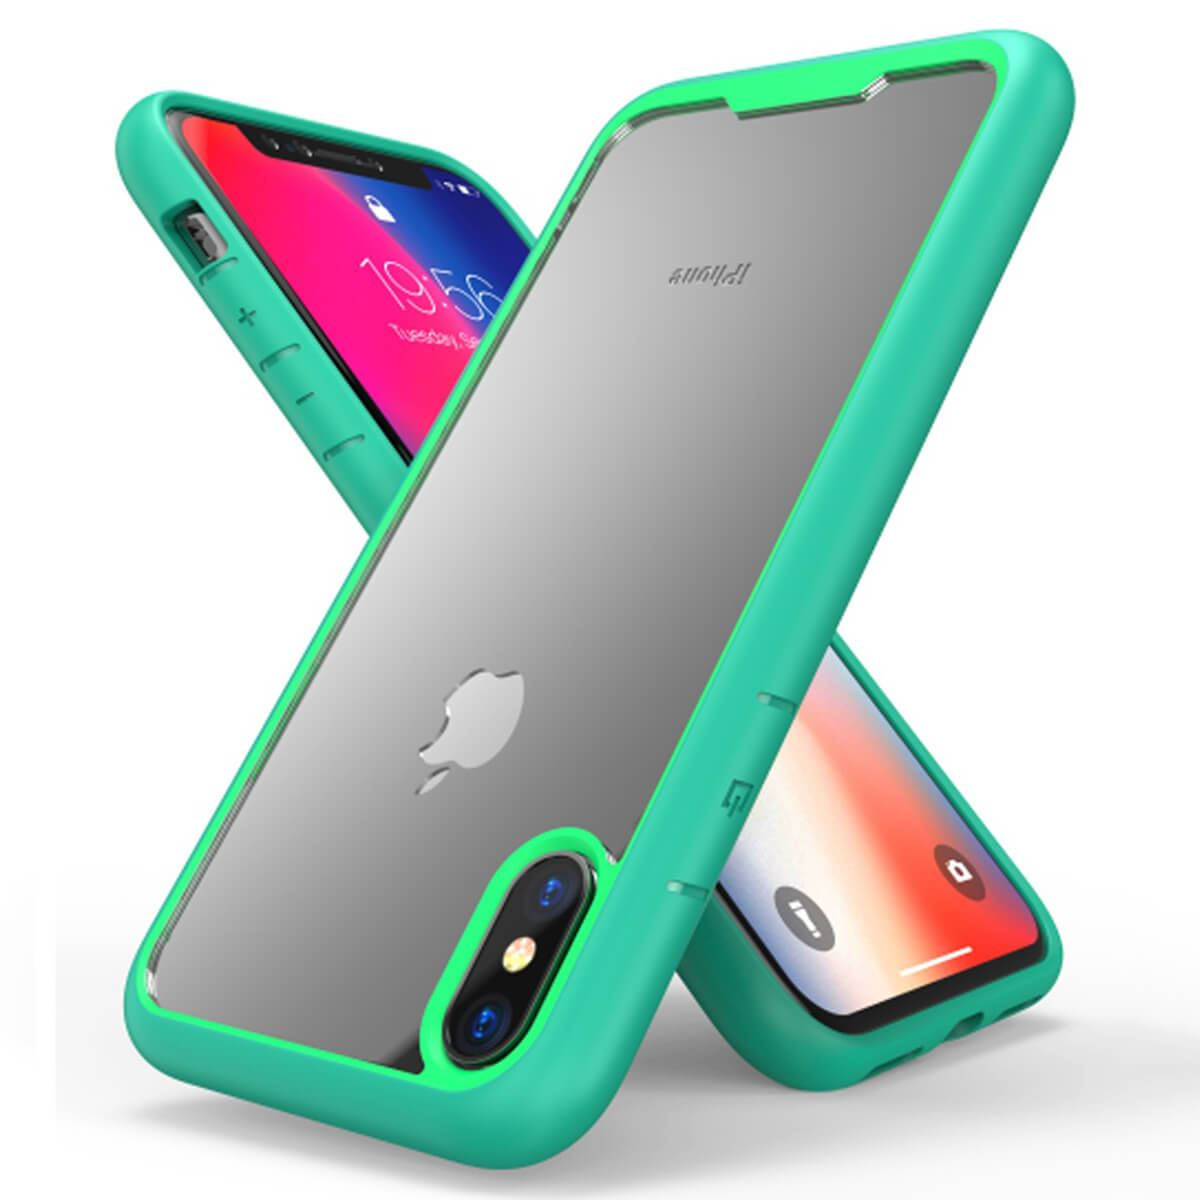 Shockproof-Bumper-Case-For-iPhone-X-XS-XR-6-Plus-7-Plus-6-Plus-Hard-Armor thumbnail 11